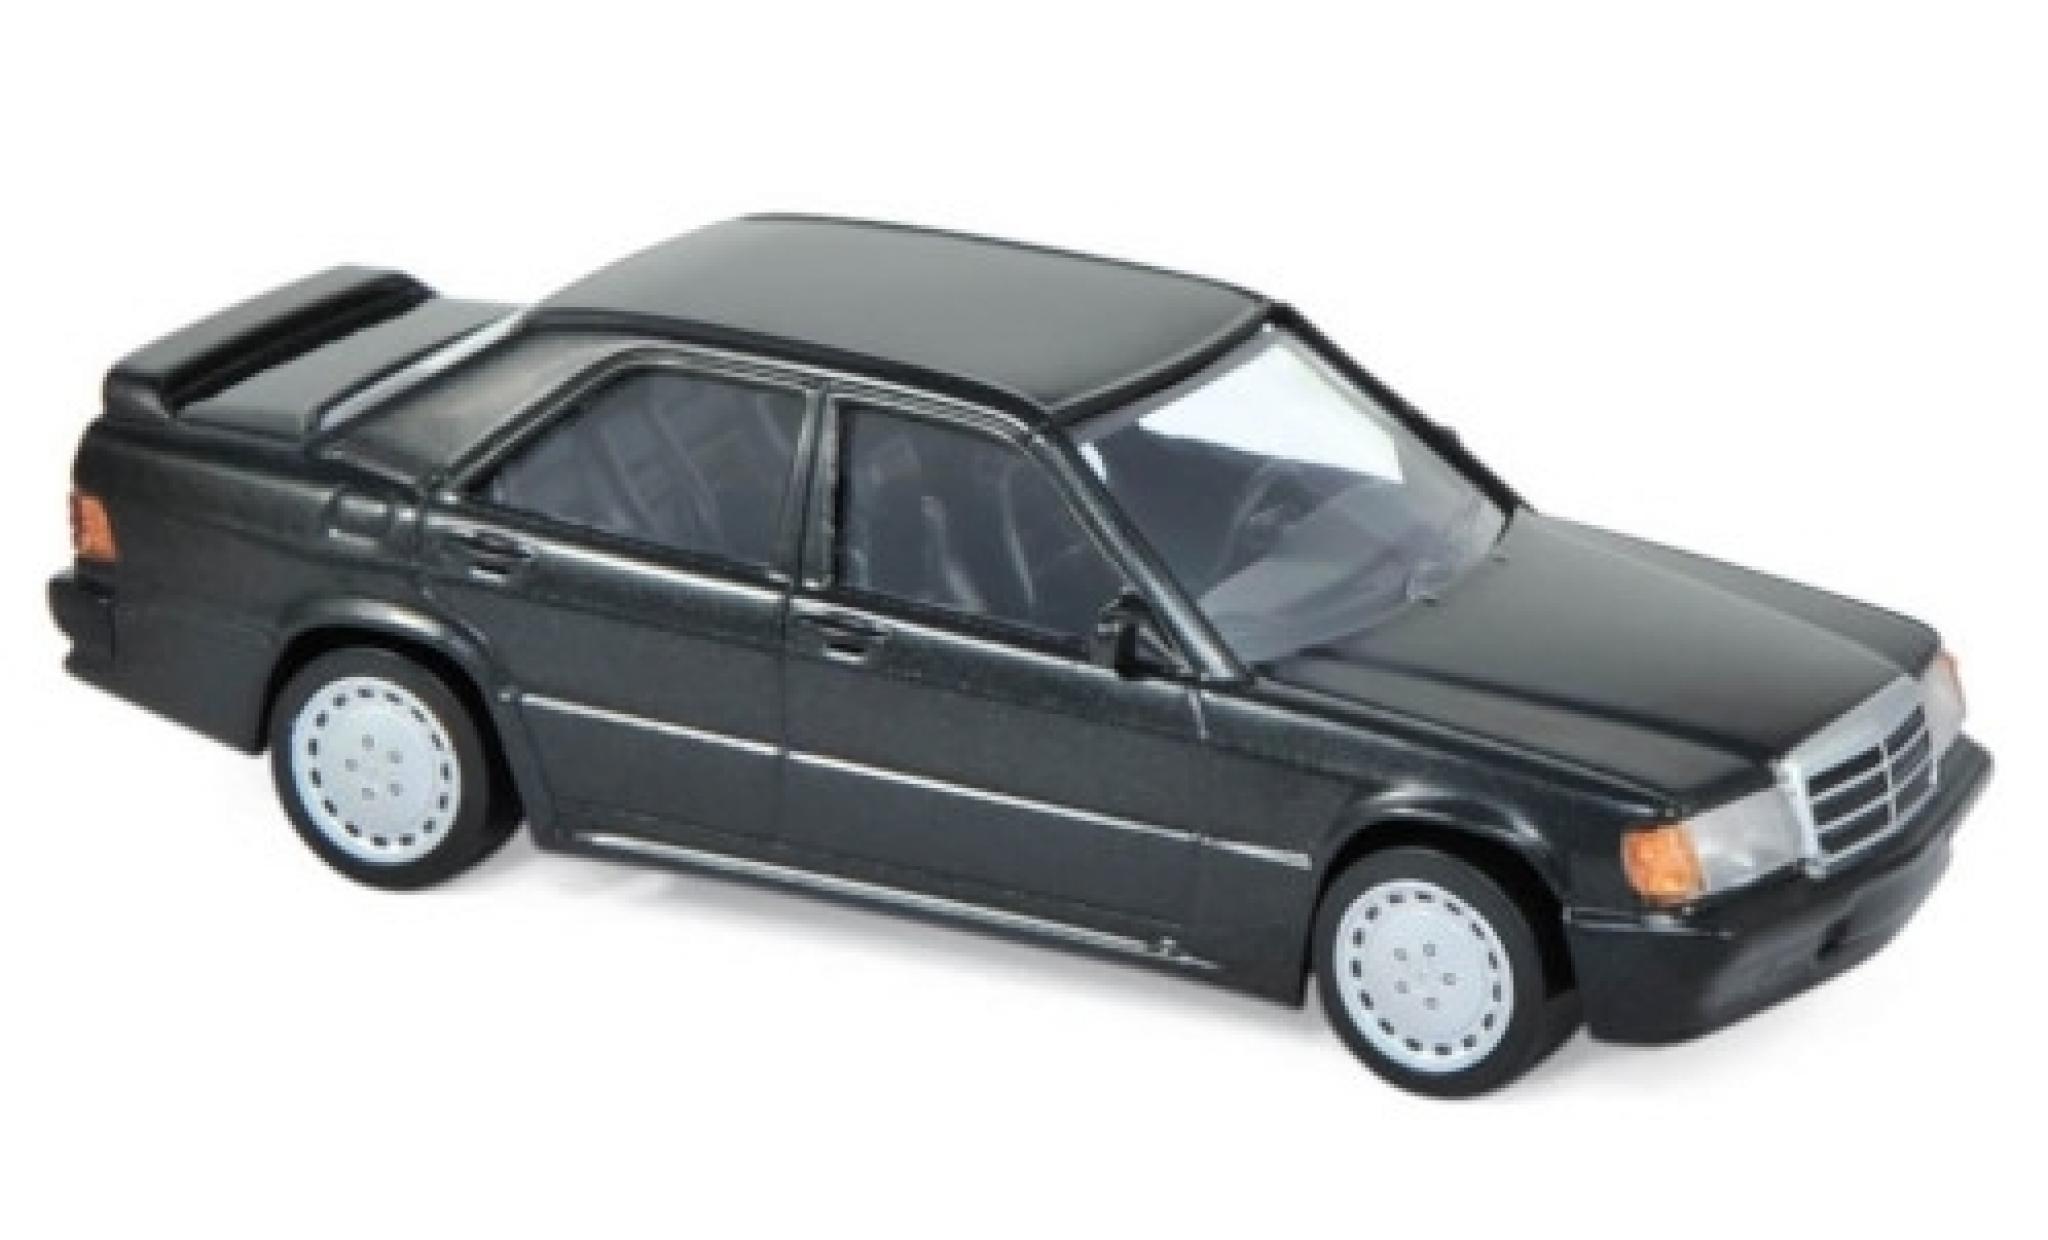 Mercedes 190 1/43 Norev E 2.3-16 (W201) metallise noire 1984 Jetcar